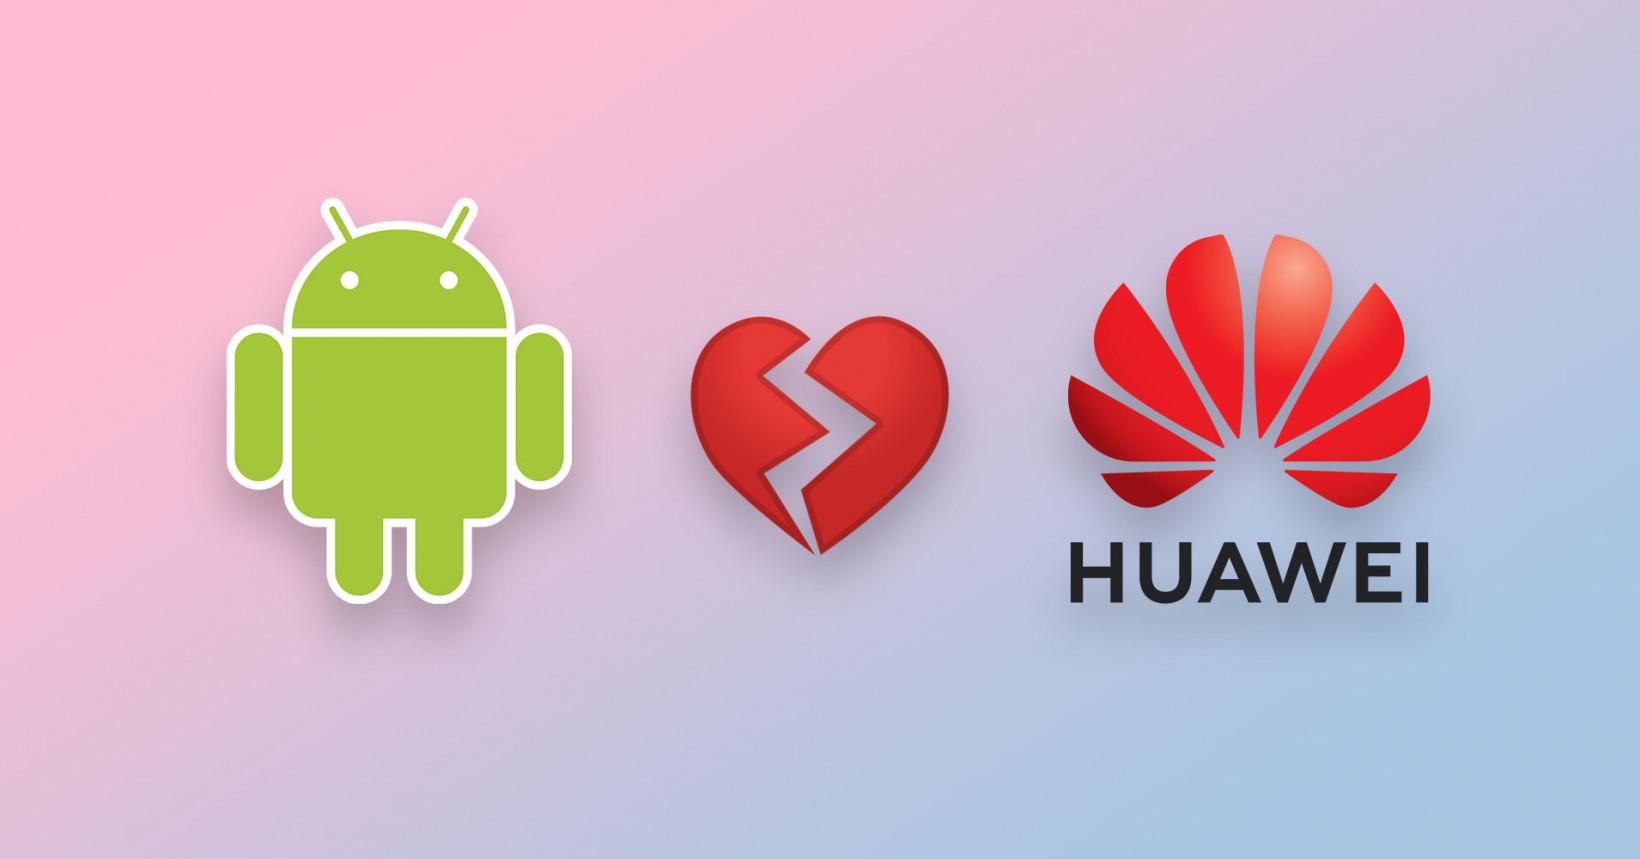 Google banna Huawei